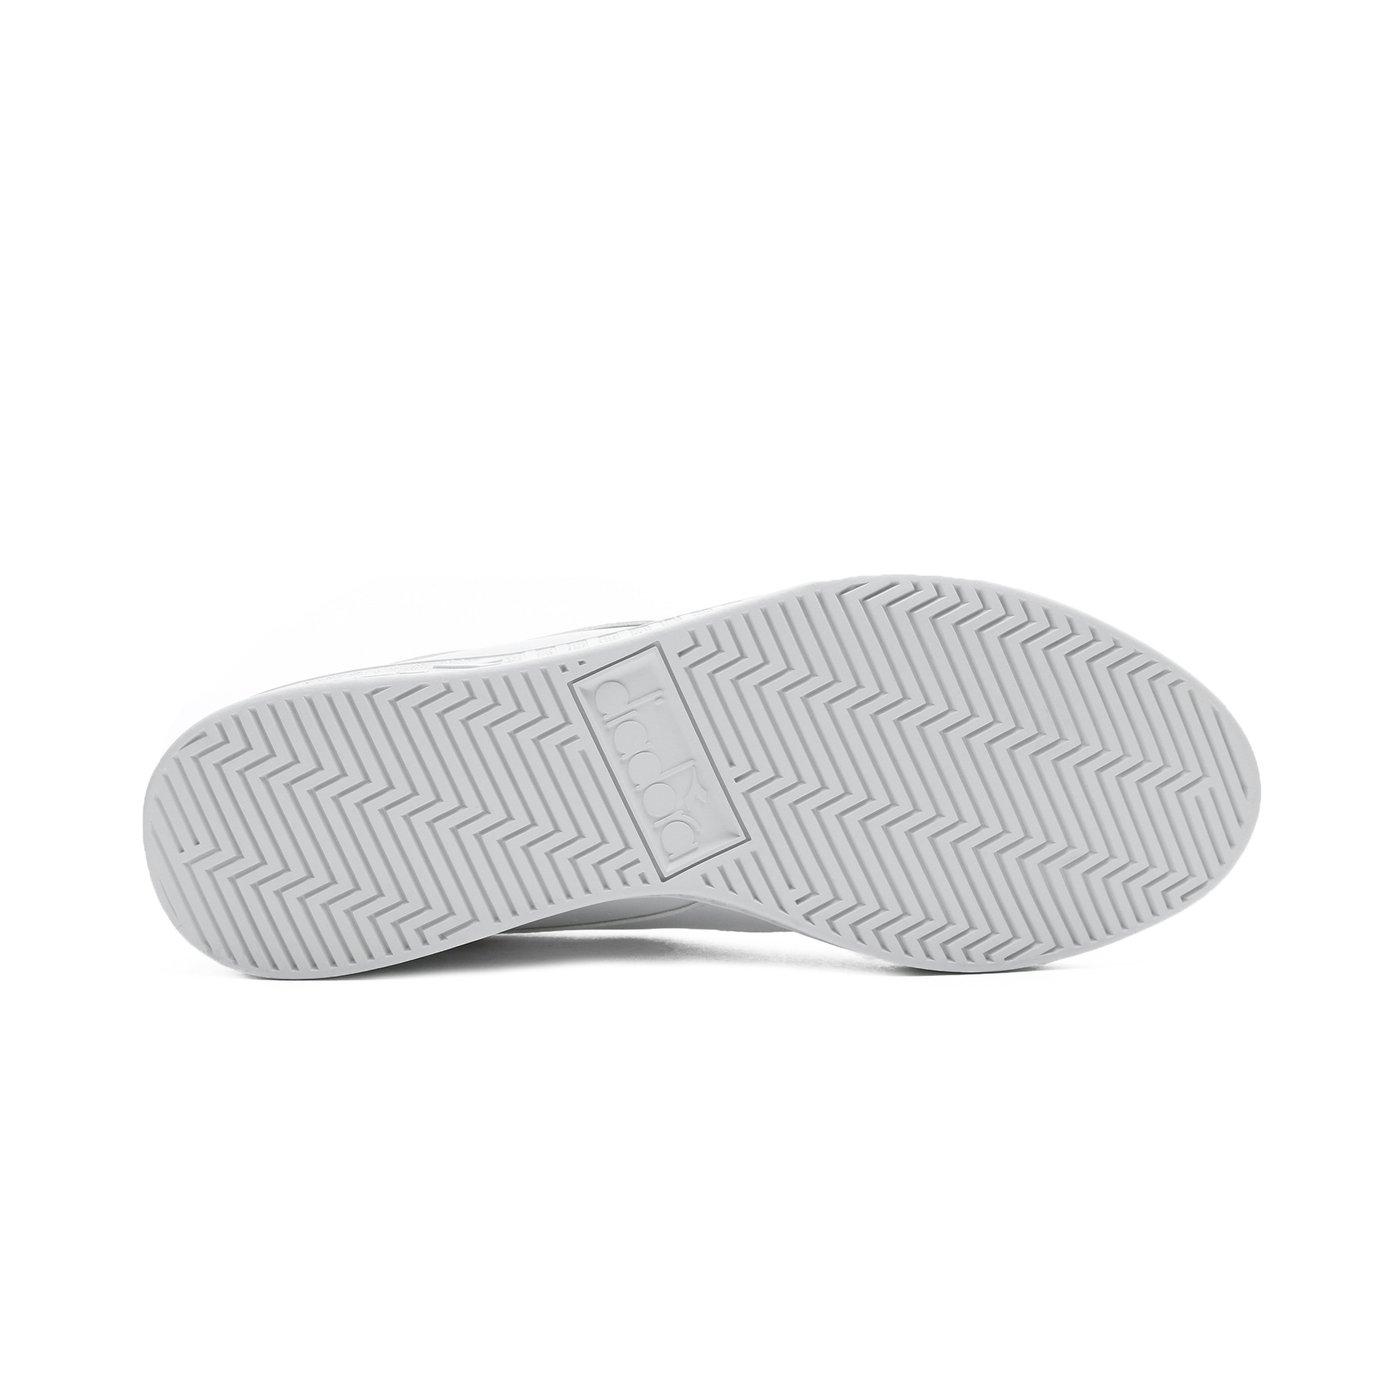 Diadora Game P Beyaz Unisex Spor Ayakkabı